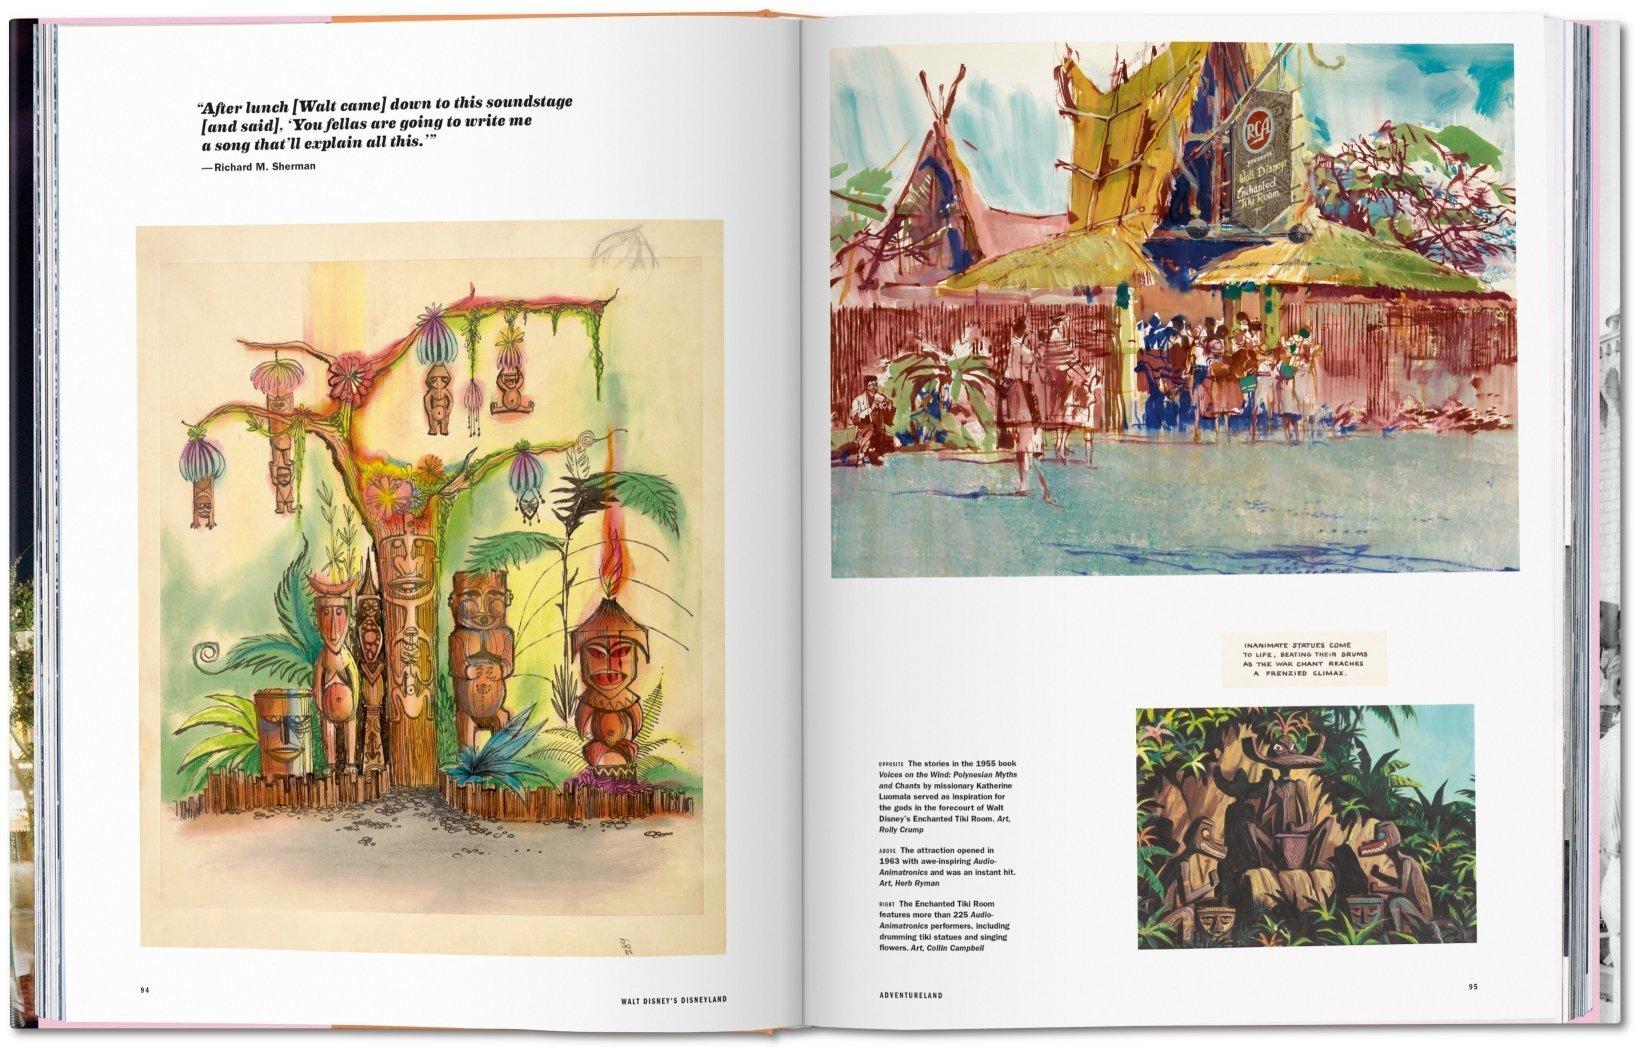 Walt Disneys Disneyland Chris Nichols 9783836563482 Amazon Com Books